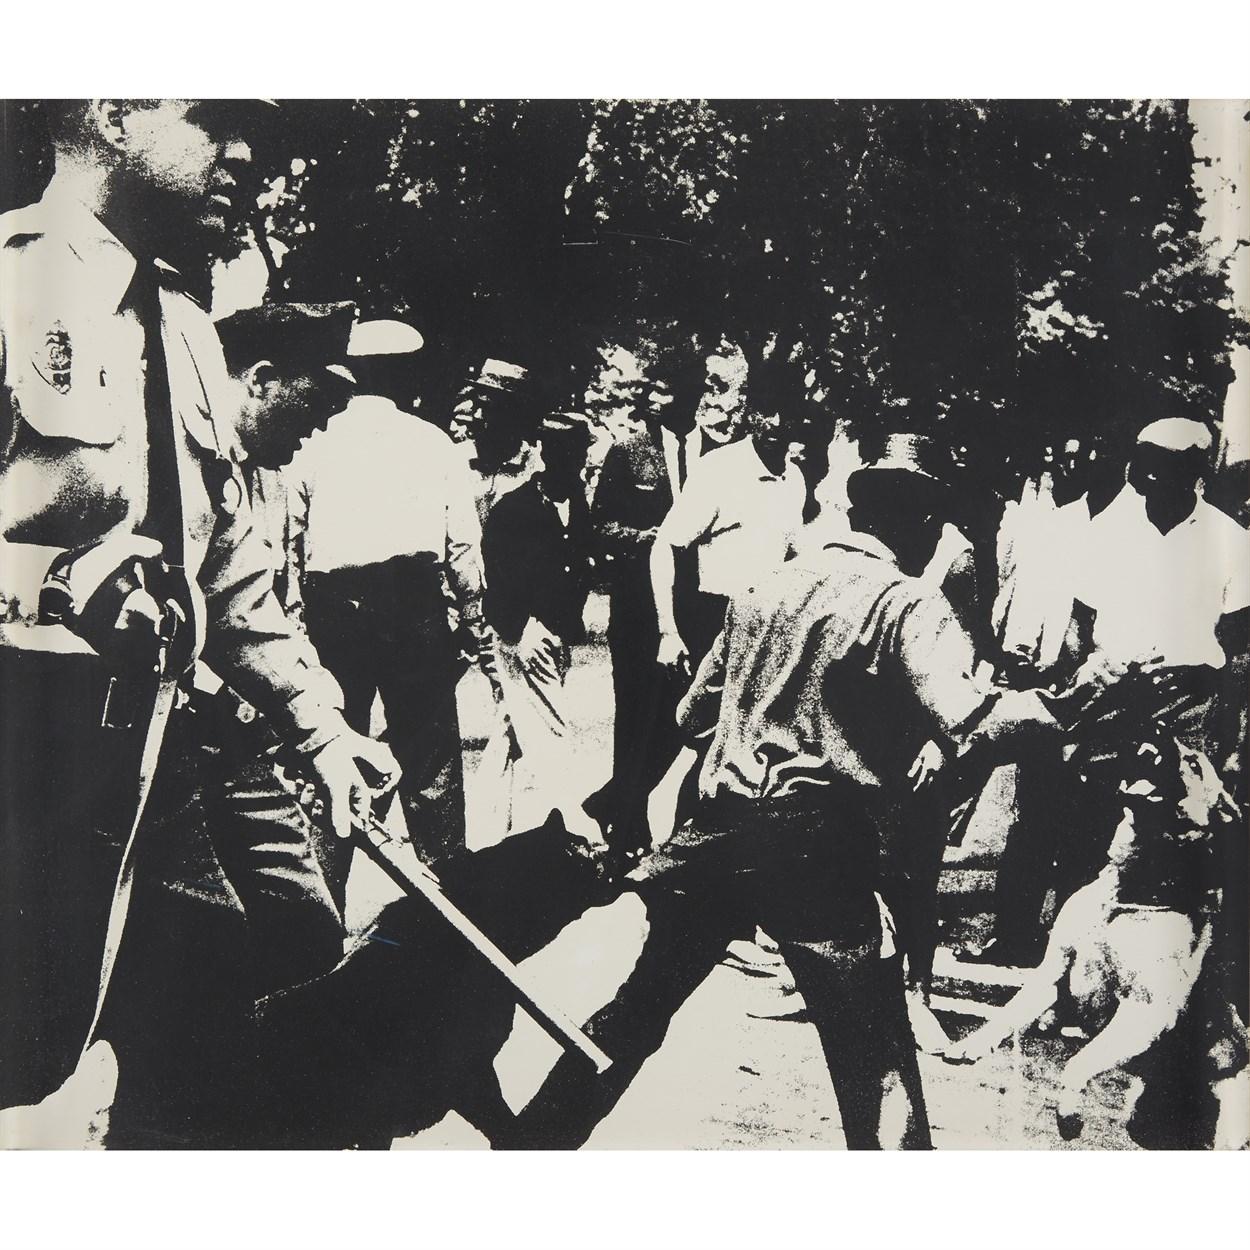 Lot 60 - Andy Warhol (American, 1928-1987)